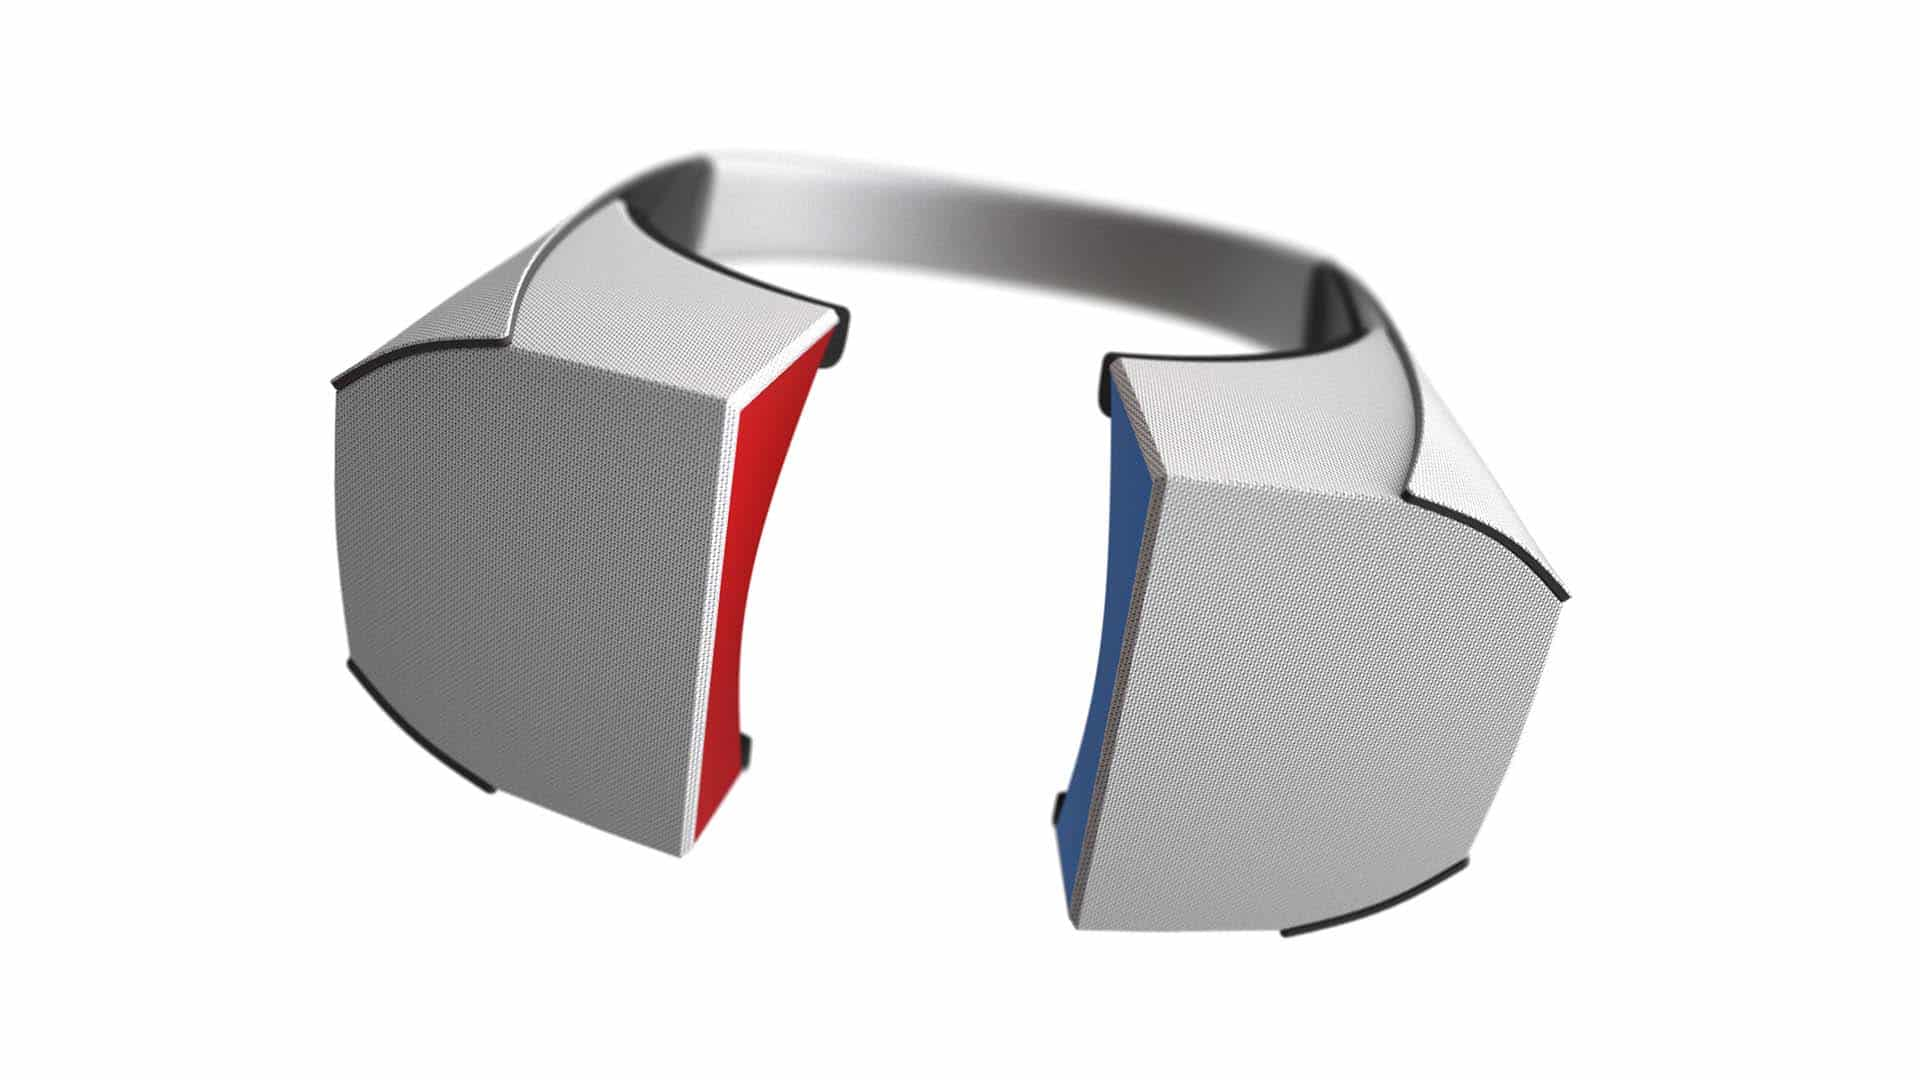 VR Headset Design from Nonobject